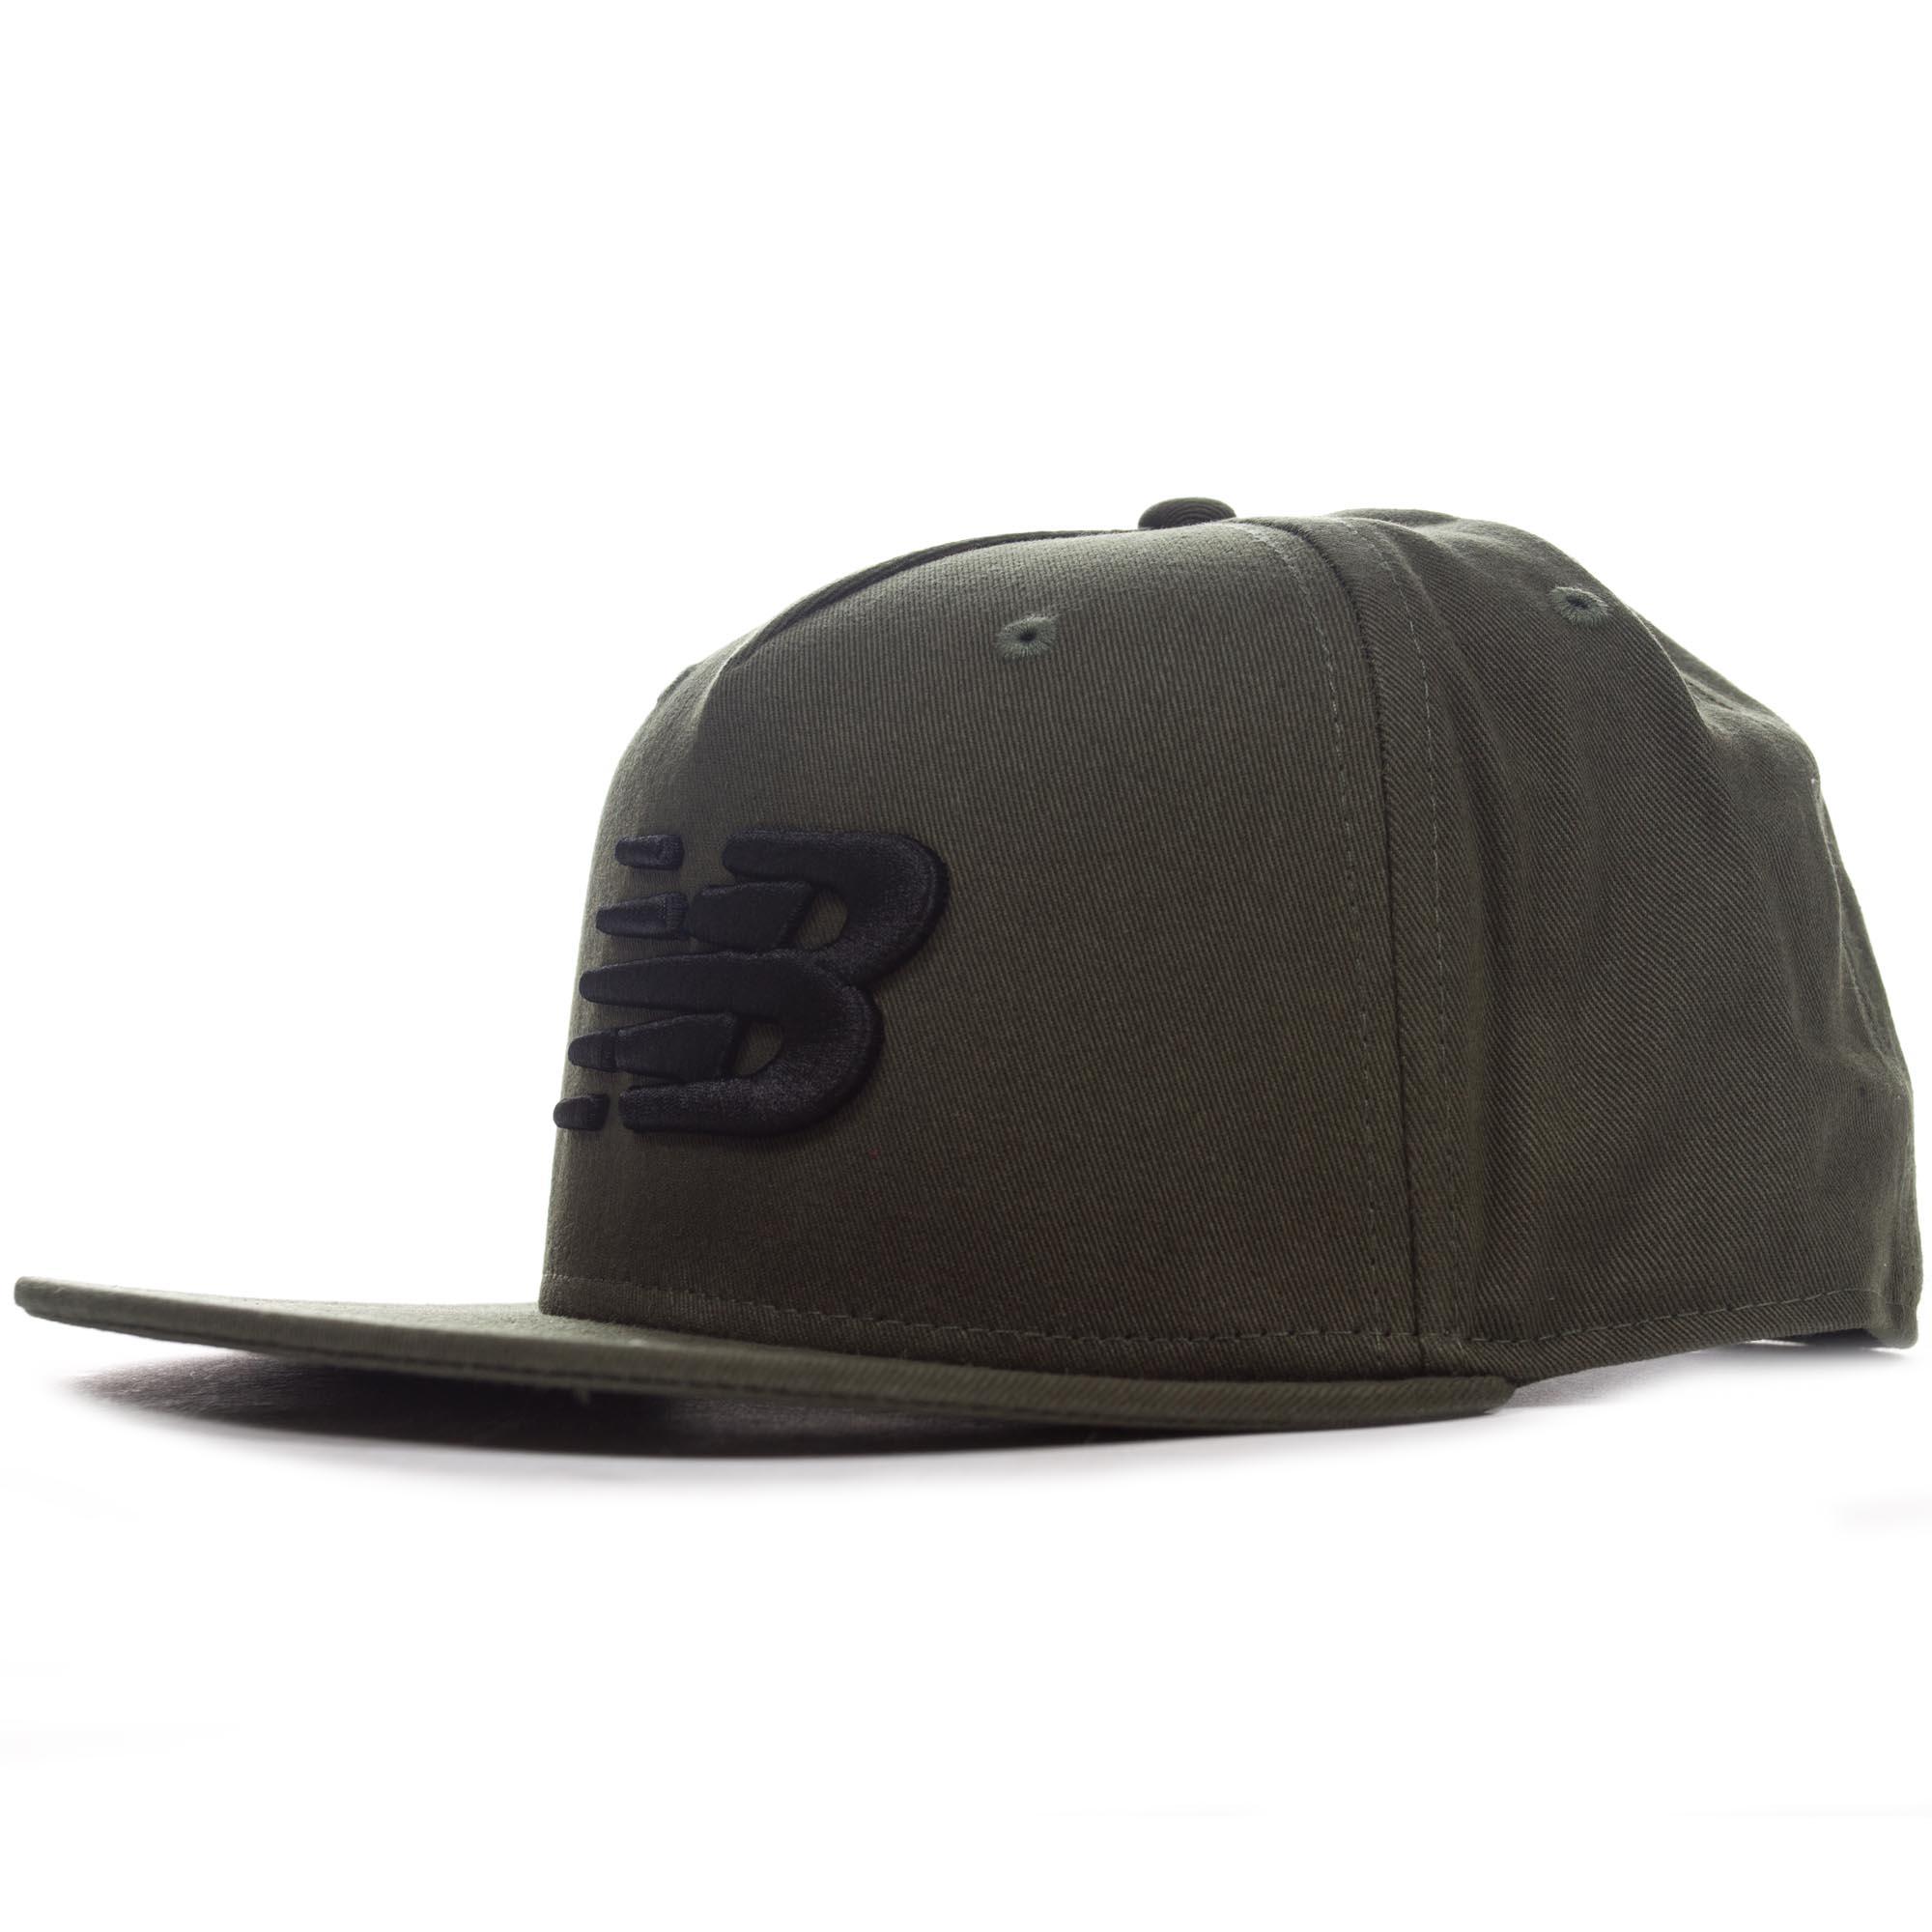 New Balance Mens 5-Panel Pro II Logo Snapback Baseball Cap Hat  45b4fe709b7